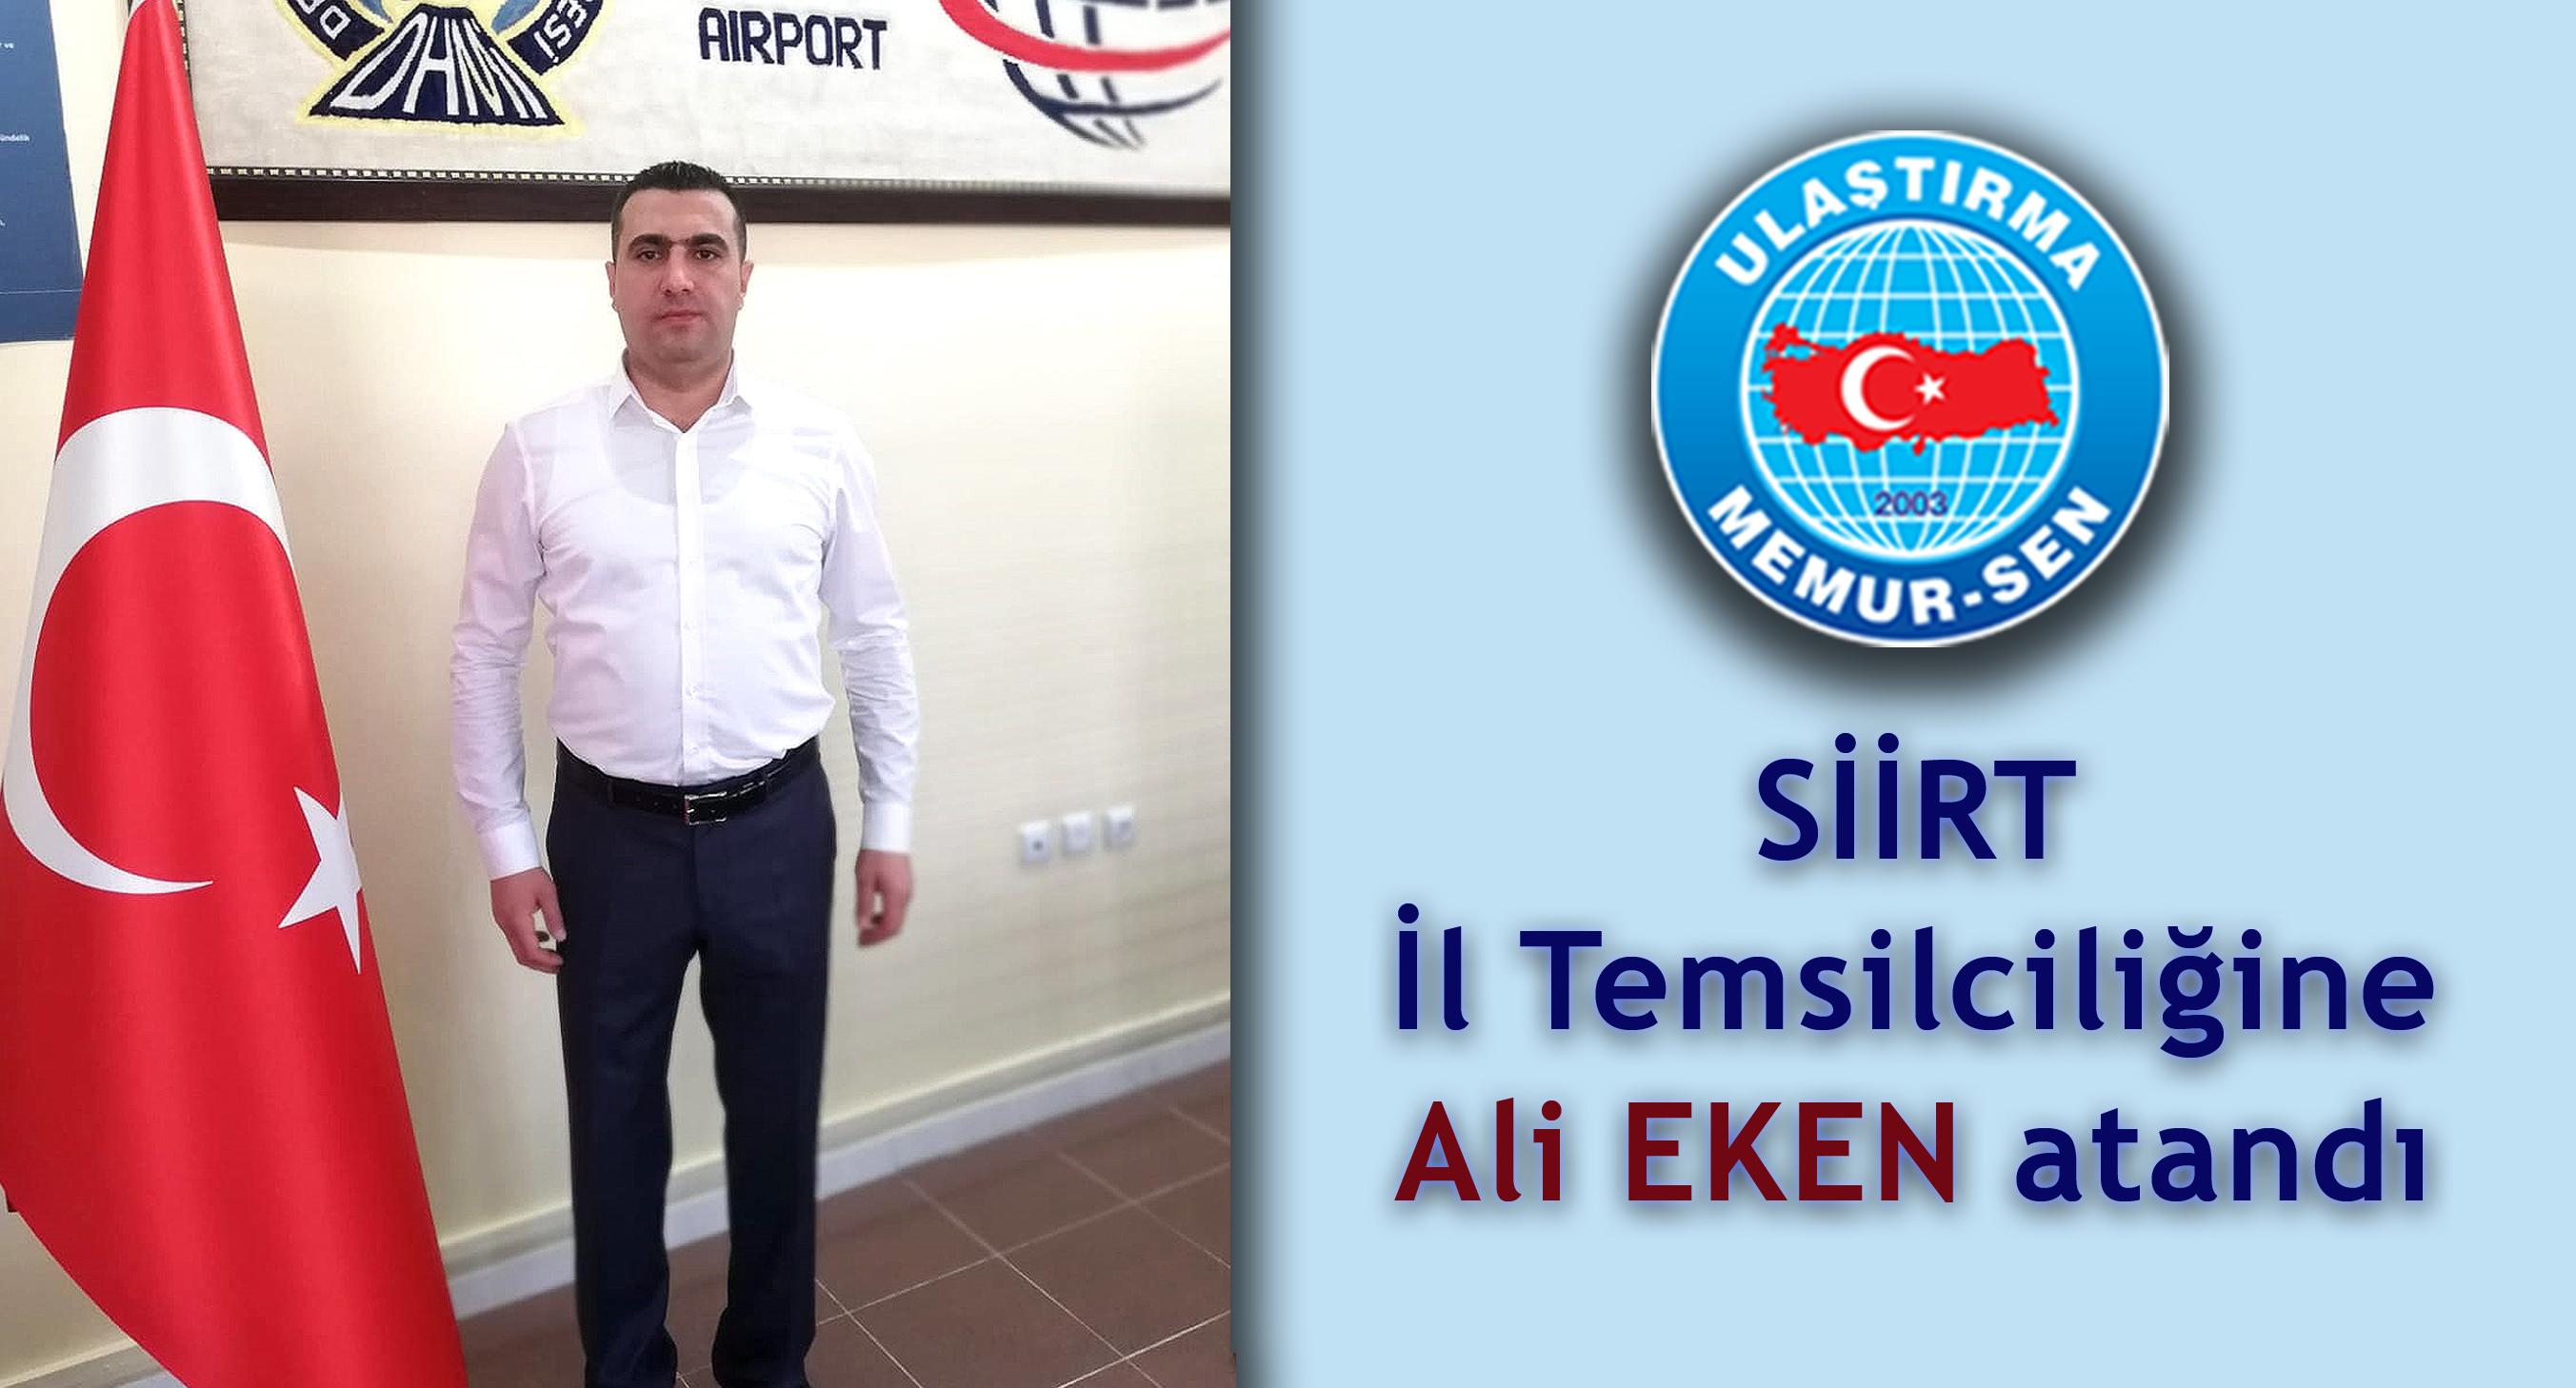 Siirt İl Temsilciliğine Ali Eken atandı